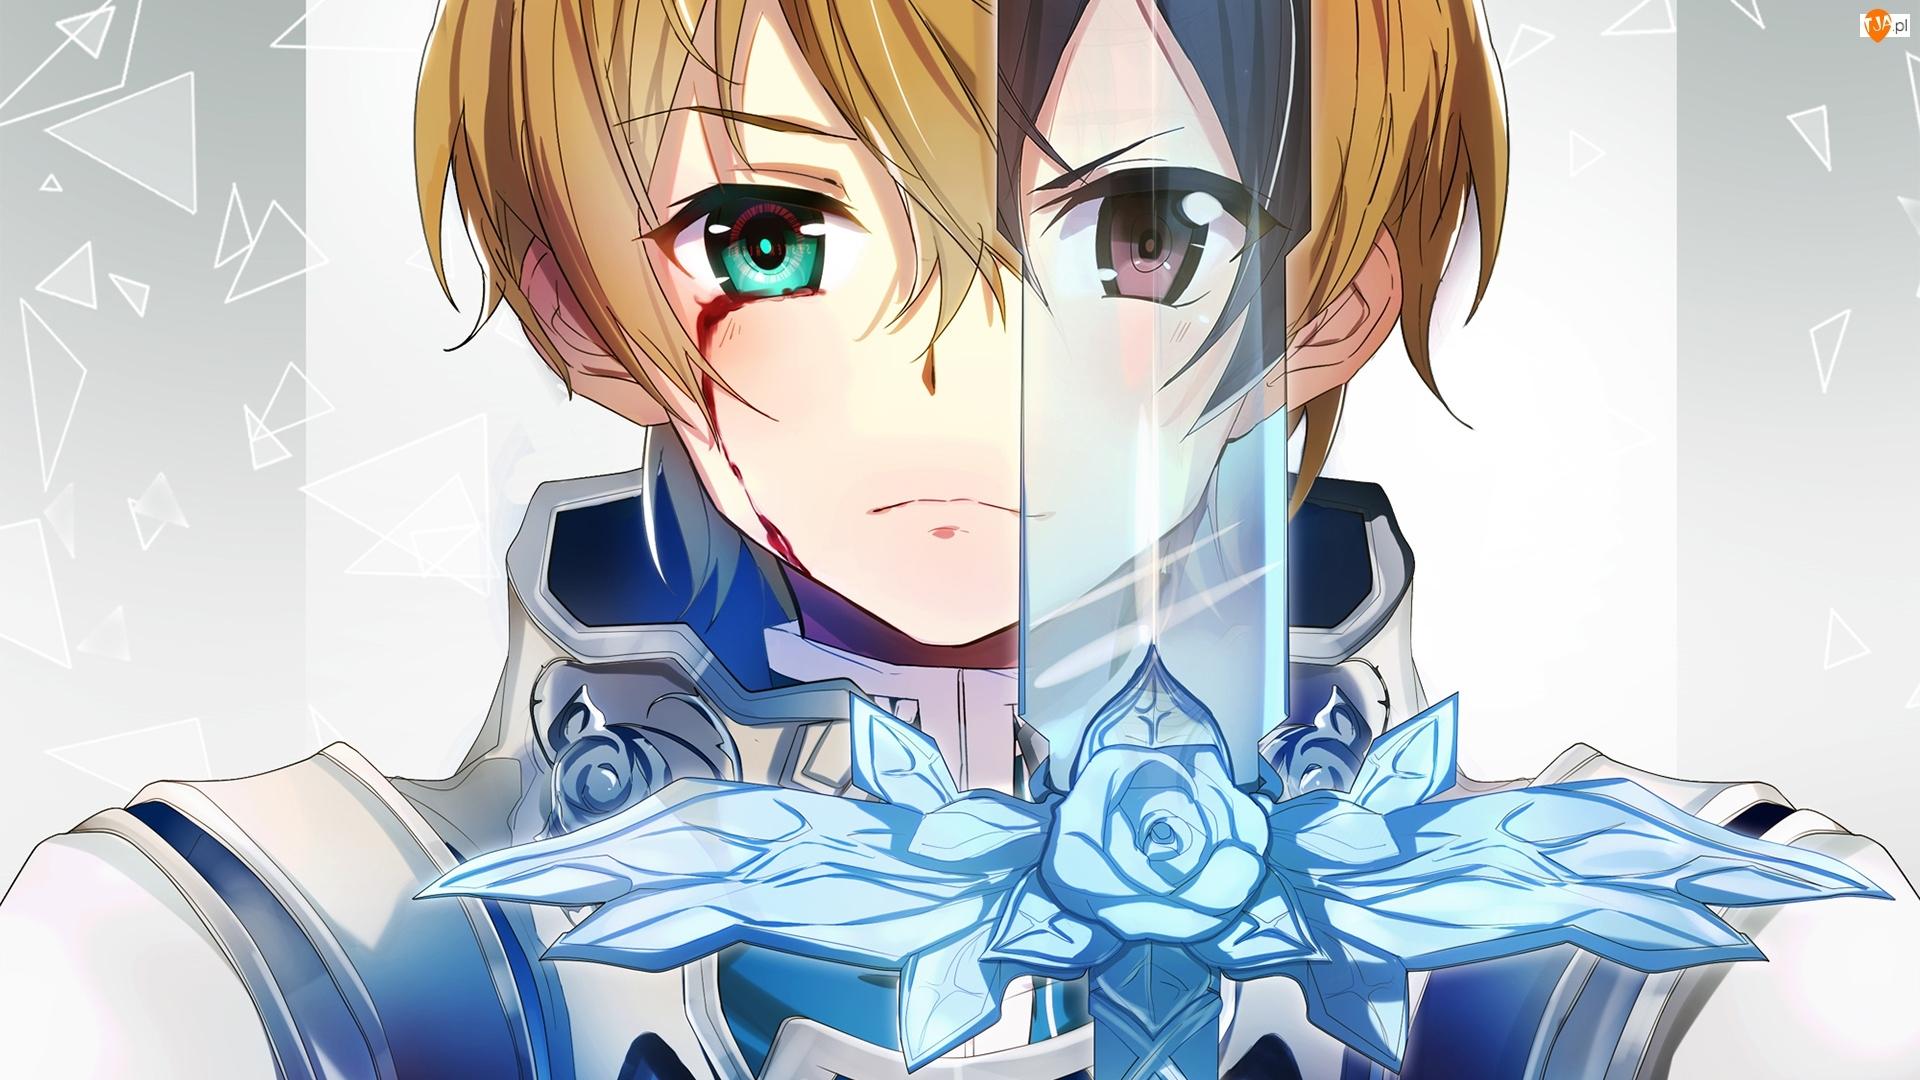 Rycerz, Sword Art Online, Miecz, Manga Anime